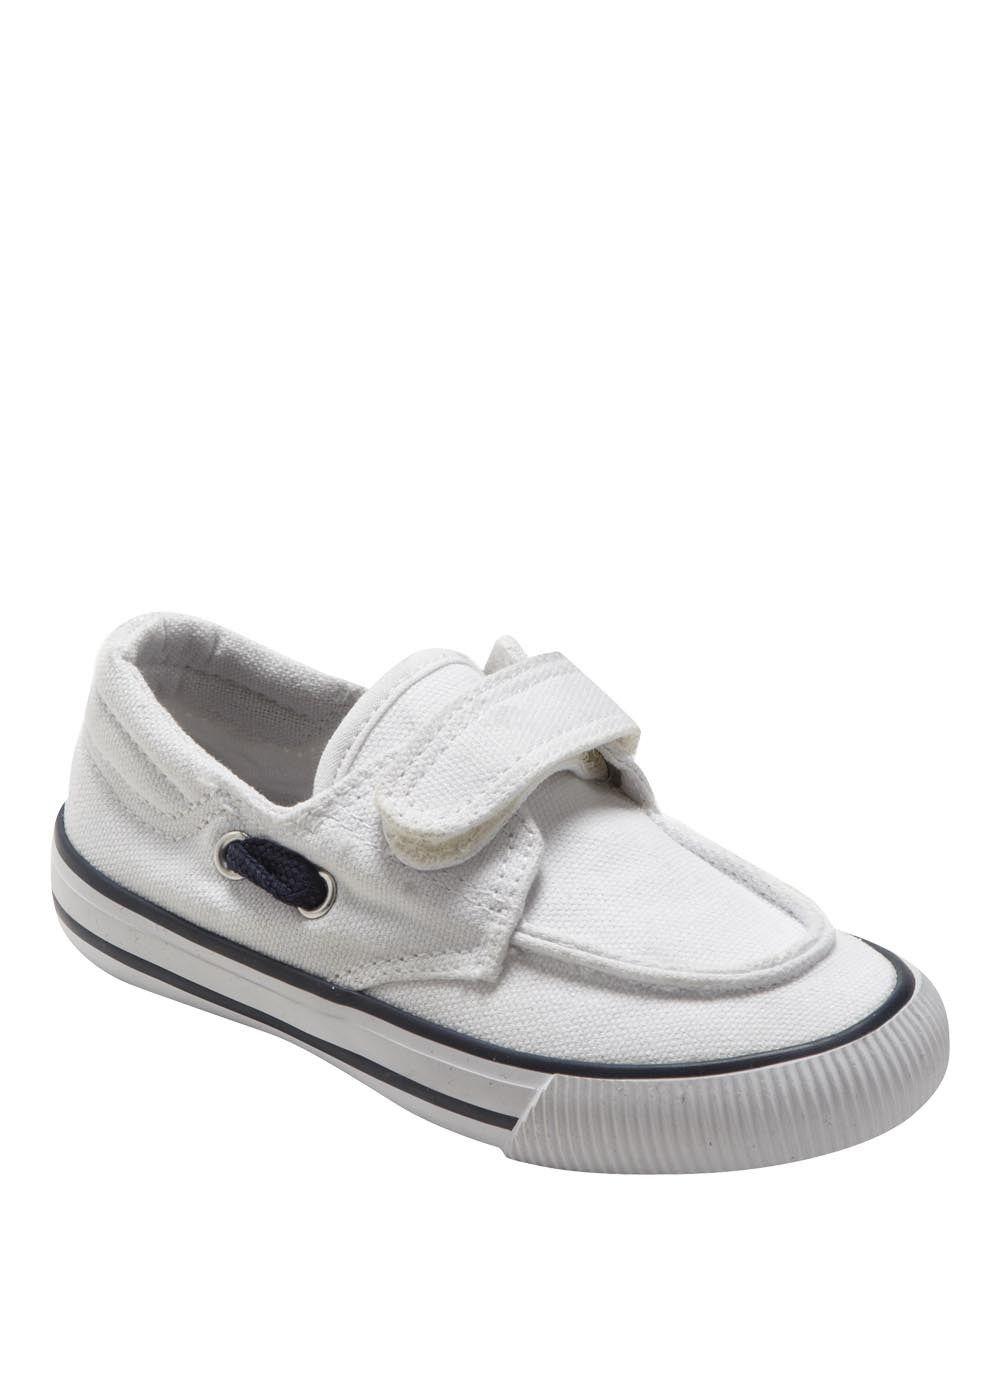 Boys Deck Shoe - Matalan £7.00 - would